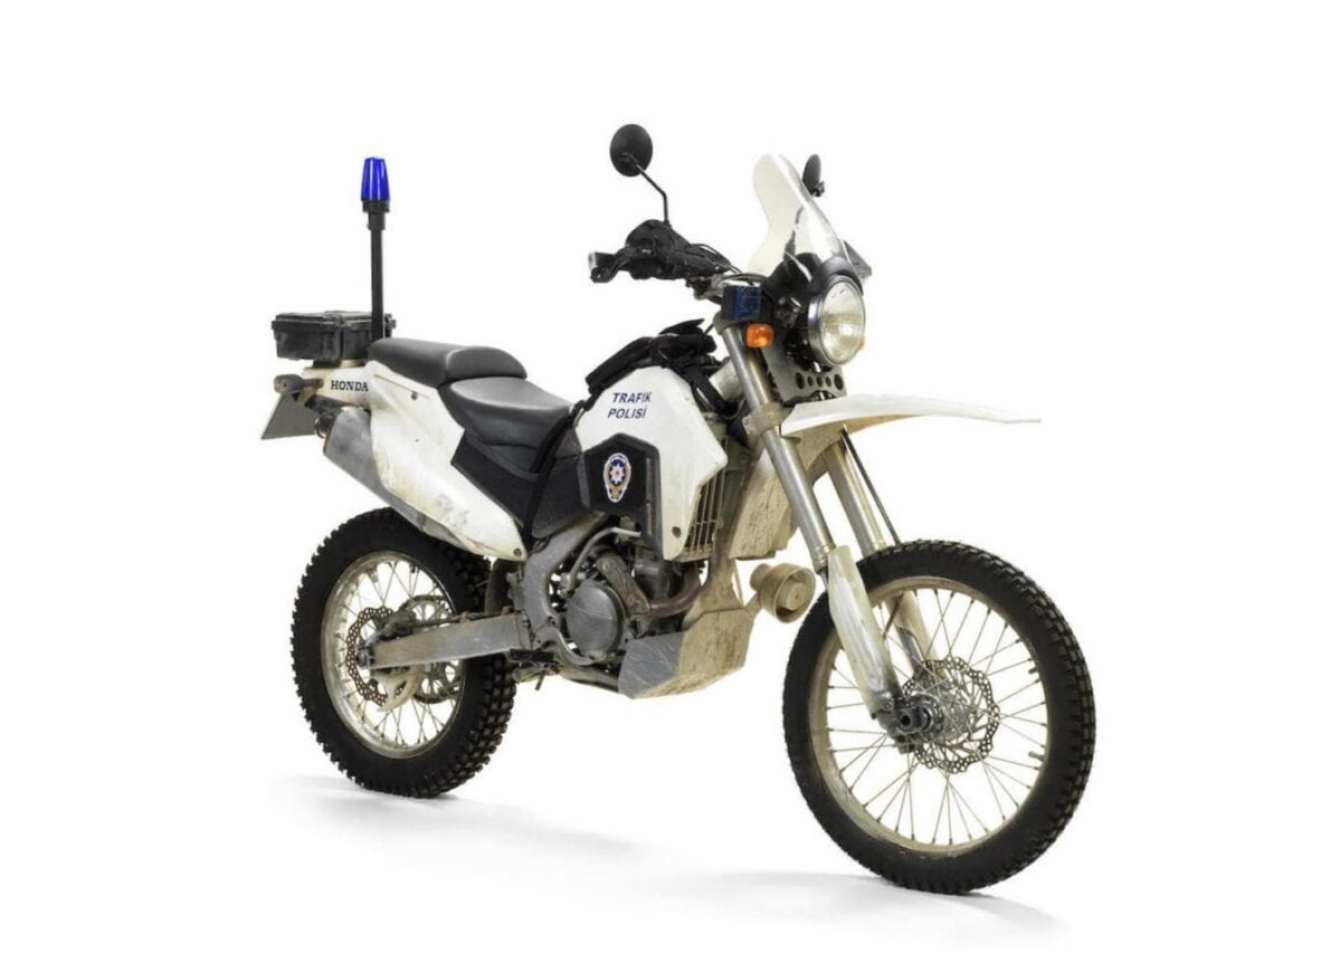 Honda-CRF250R-Motorcycle-Skyfall-James-Bond-1-1480x1073